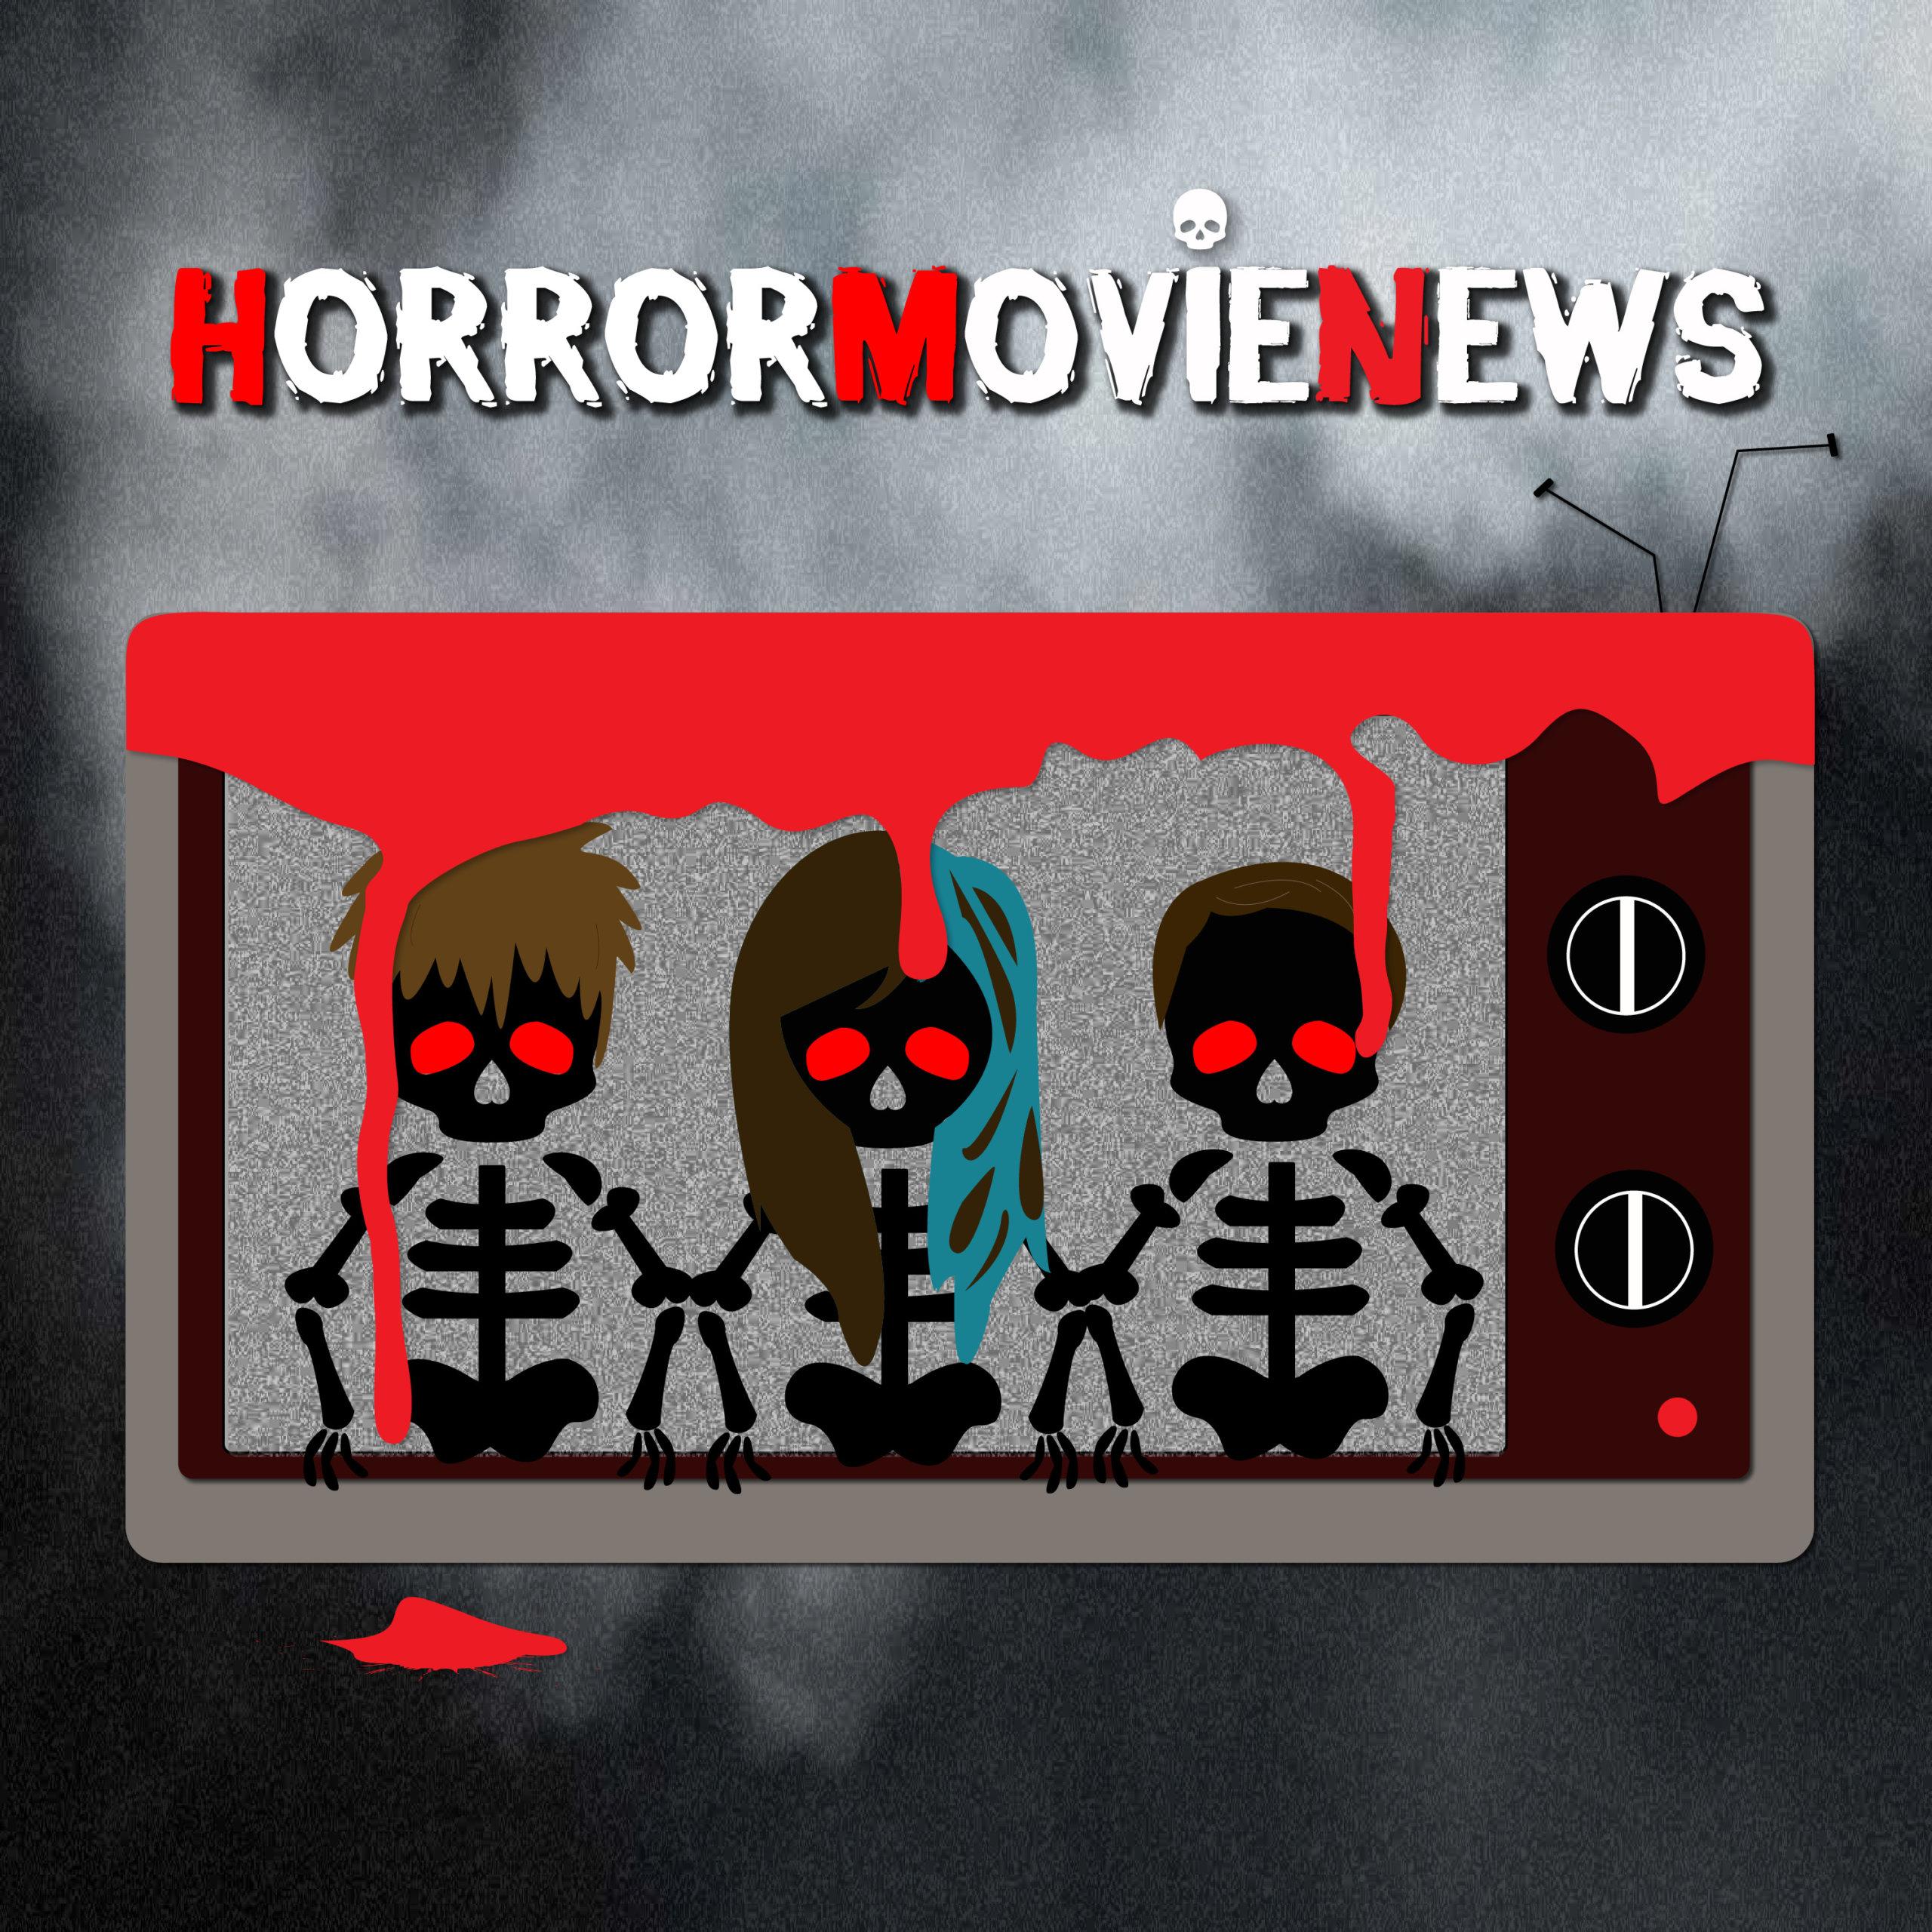 Horror Movie News